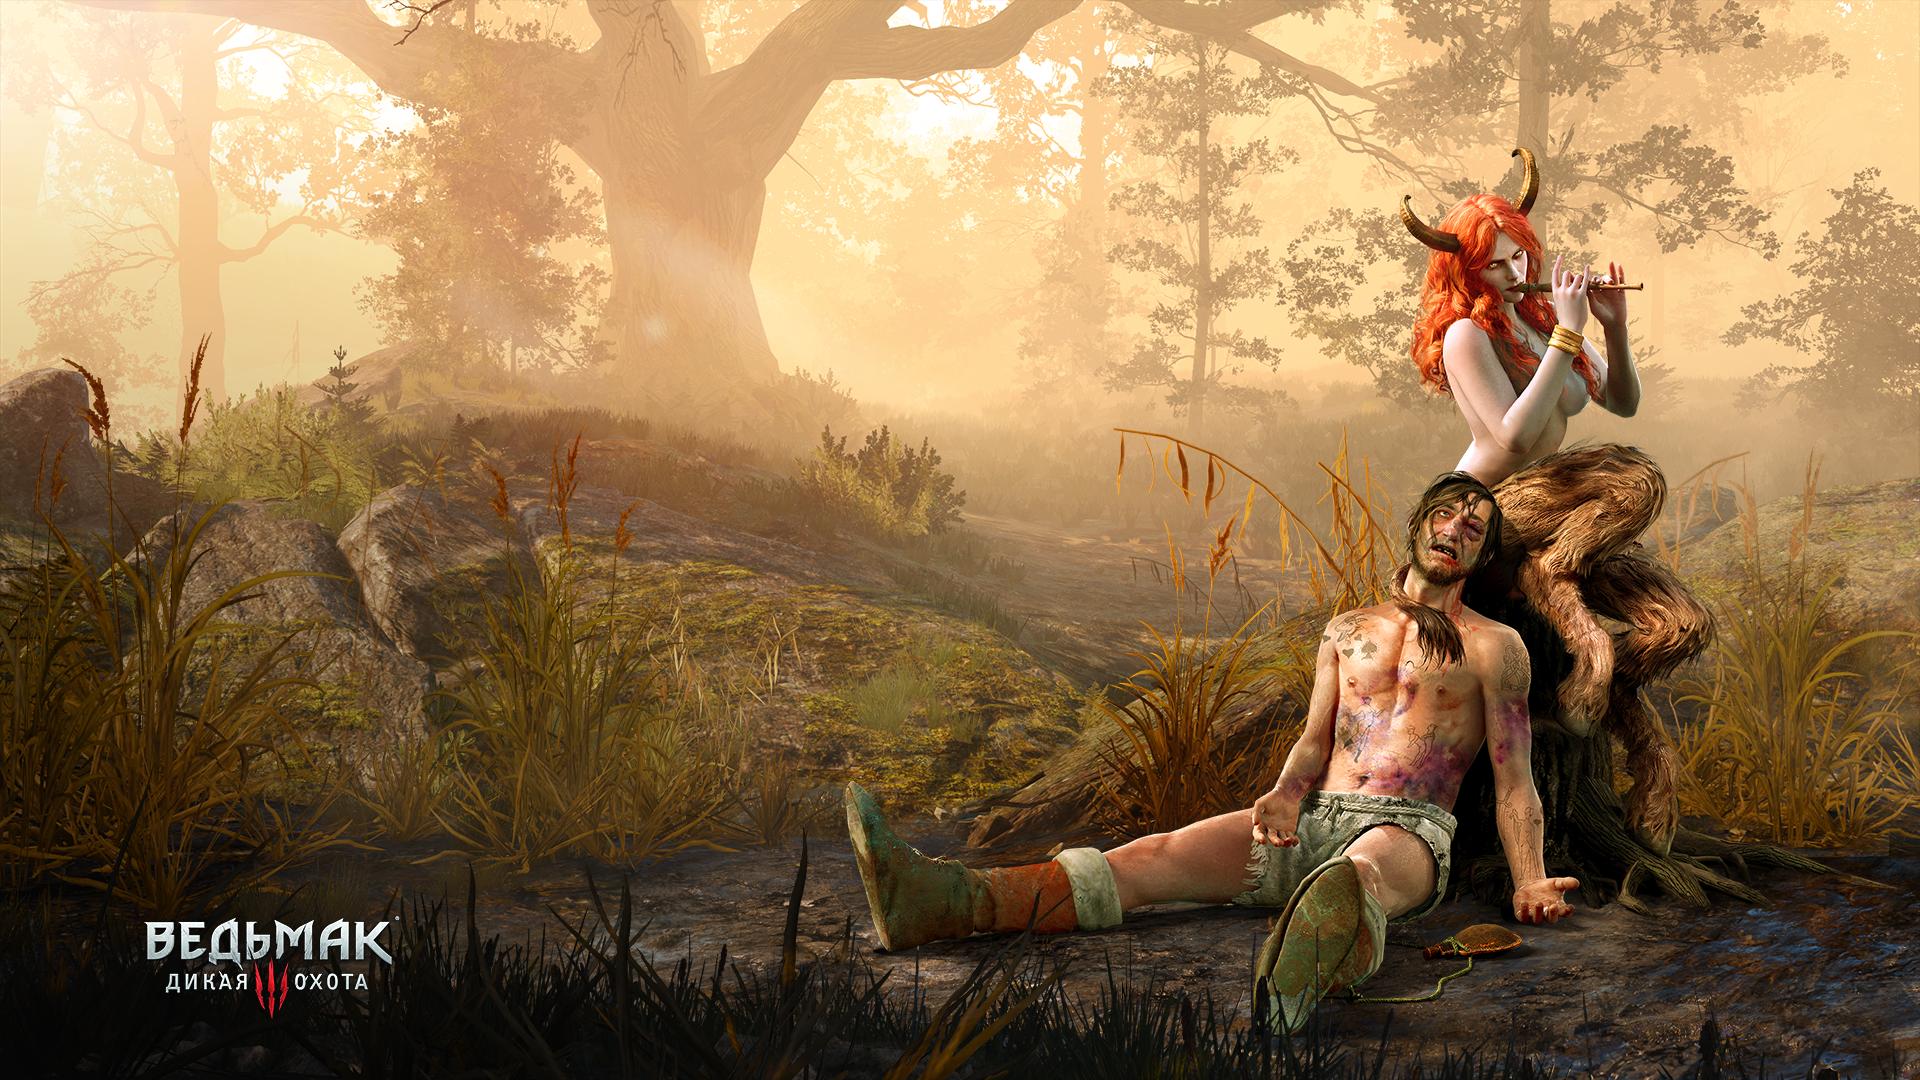 Сравнение The Witcher 3 на Xbox One X, PlayStation 4 Pro и PC